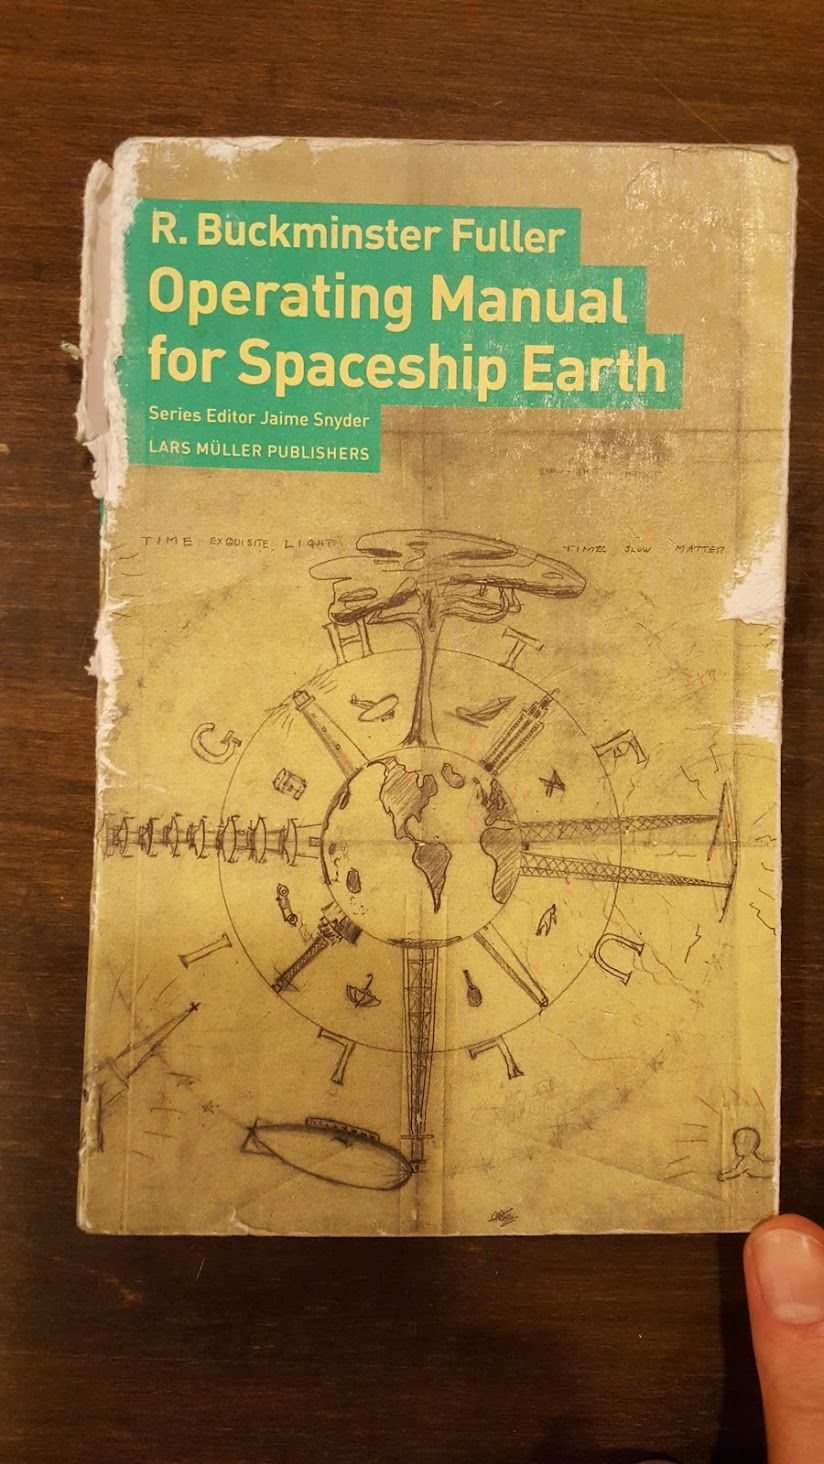 R. Buckminster Fuller - Operating Manual for Spaceship Earth